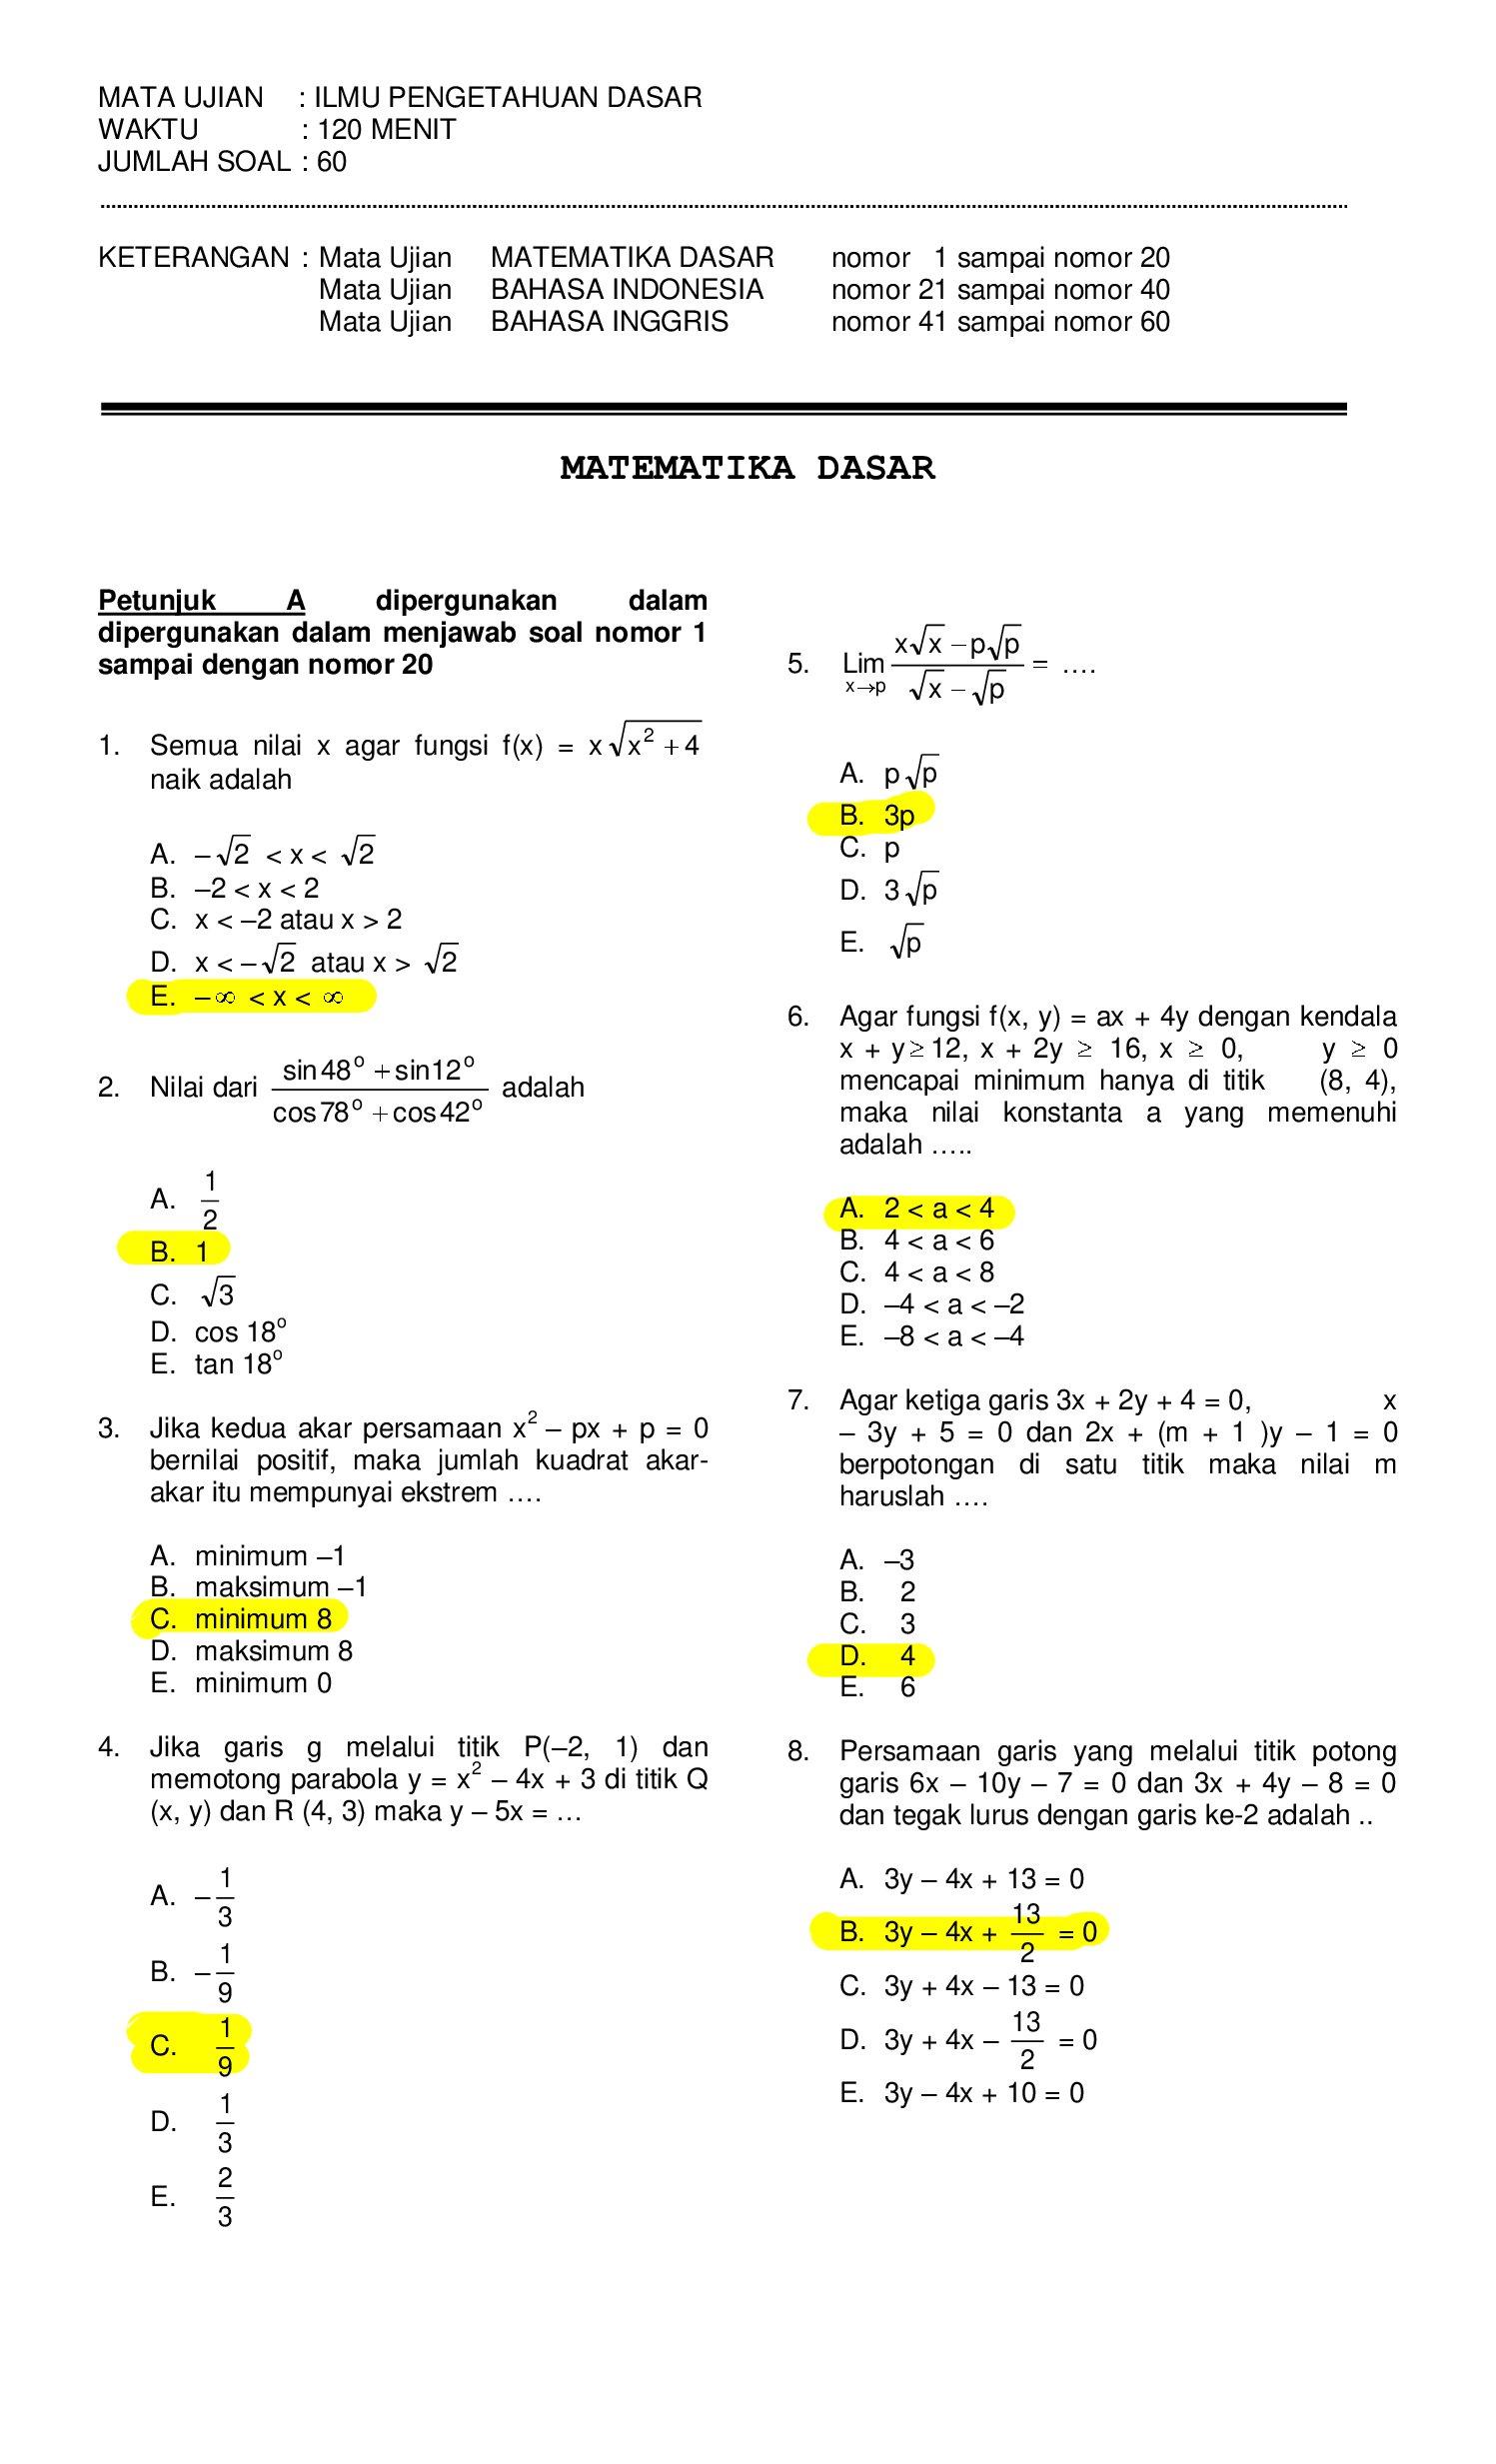 Buku bank soal matematika dasar sma. Ambisnotes Soal Matematika Dasar Ambisnotes